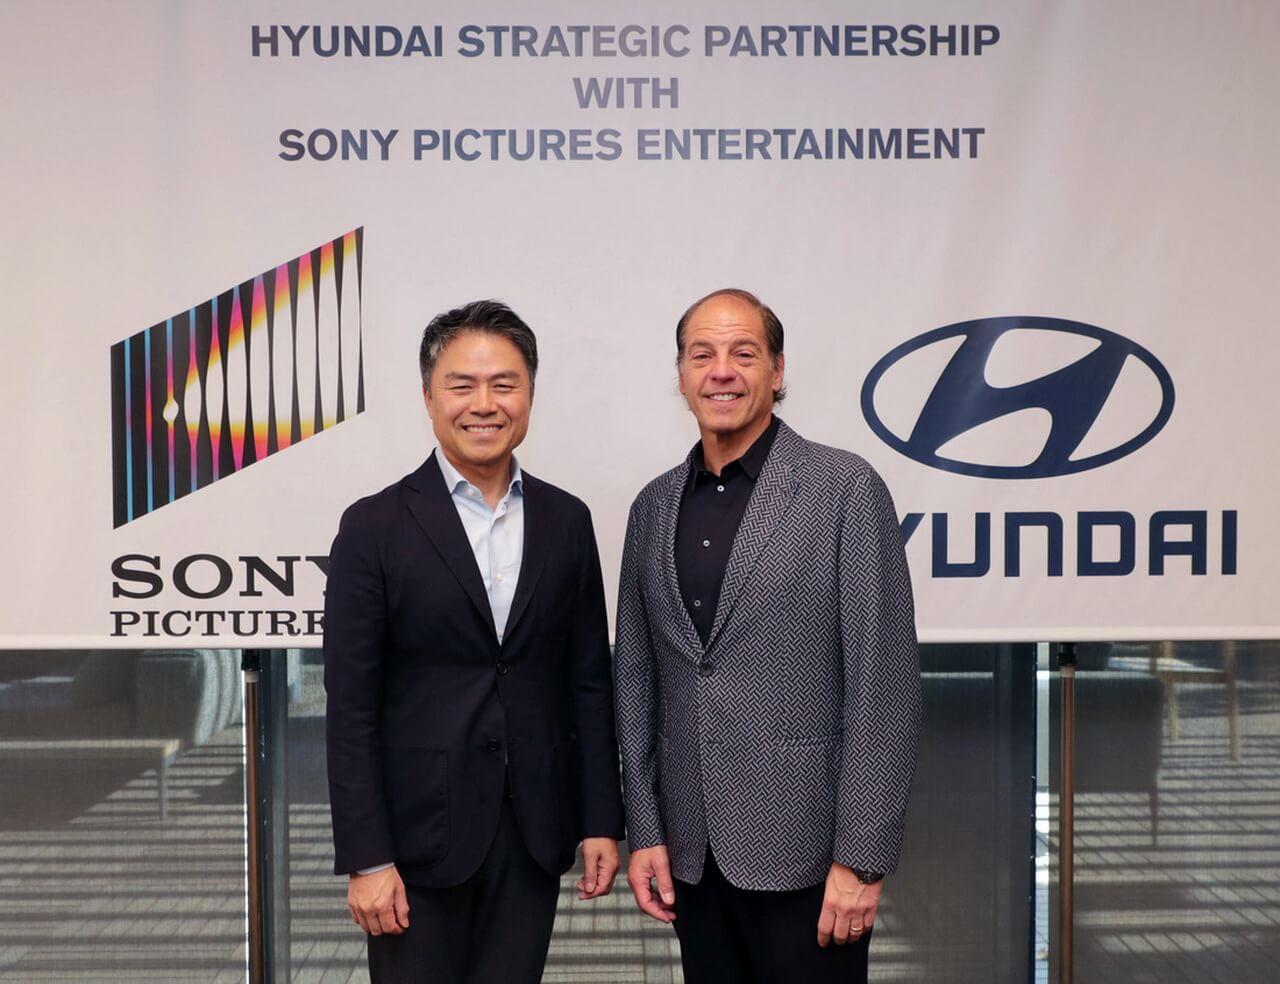 Hyundai Motor і Sony Pictures оголосили про стратегічне партнерство